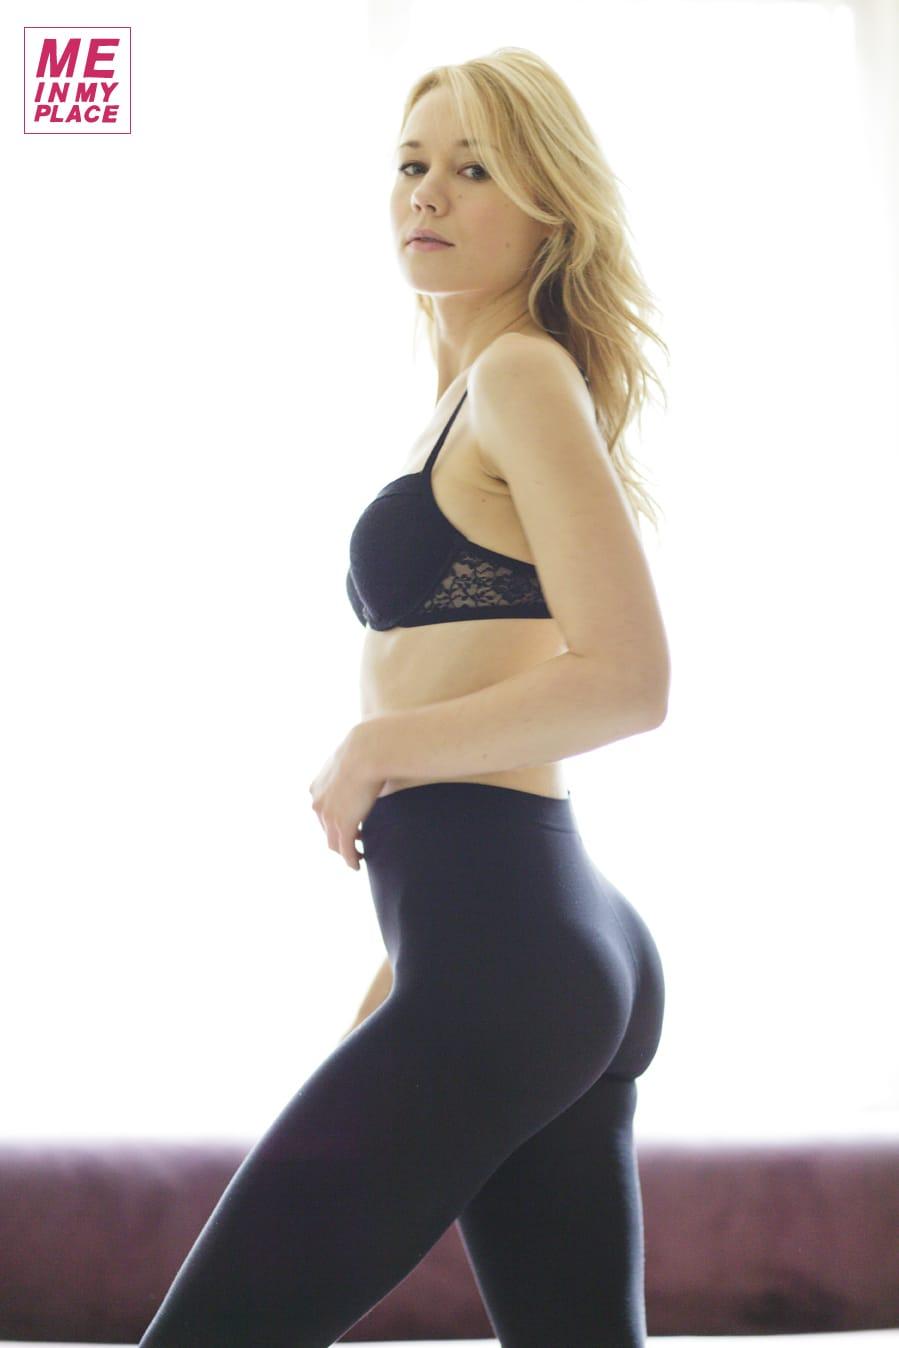 Kristen Hager naked (81 photos), Ass, Leaked, Boobs, swimsuit 2020